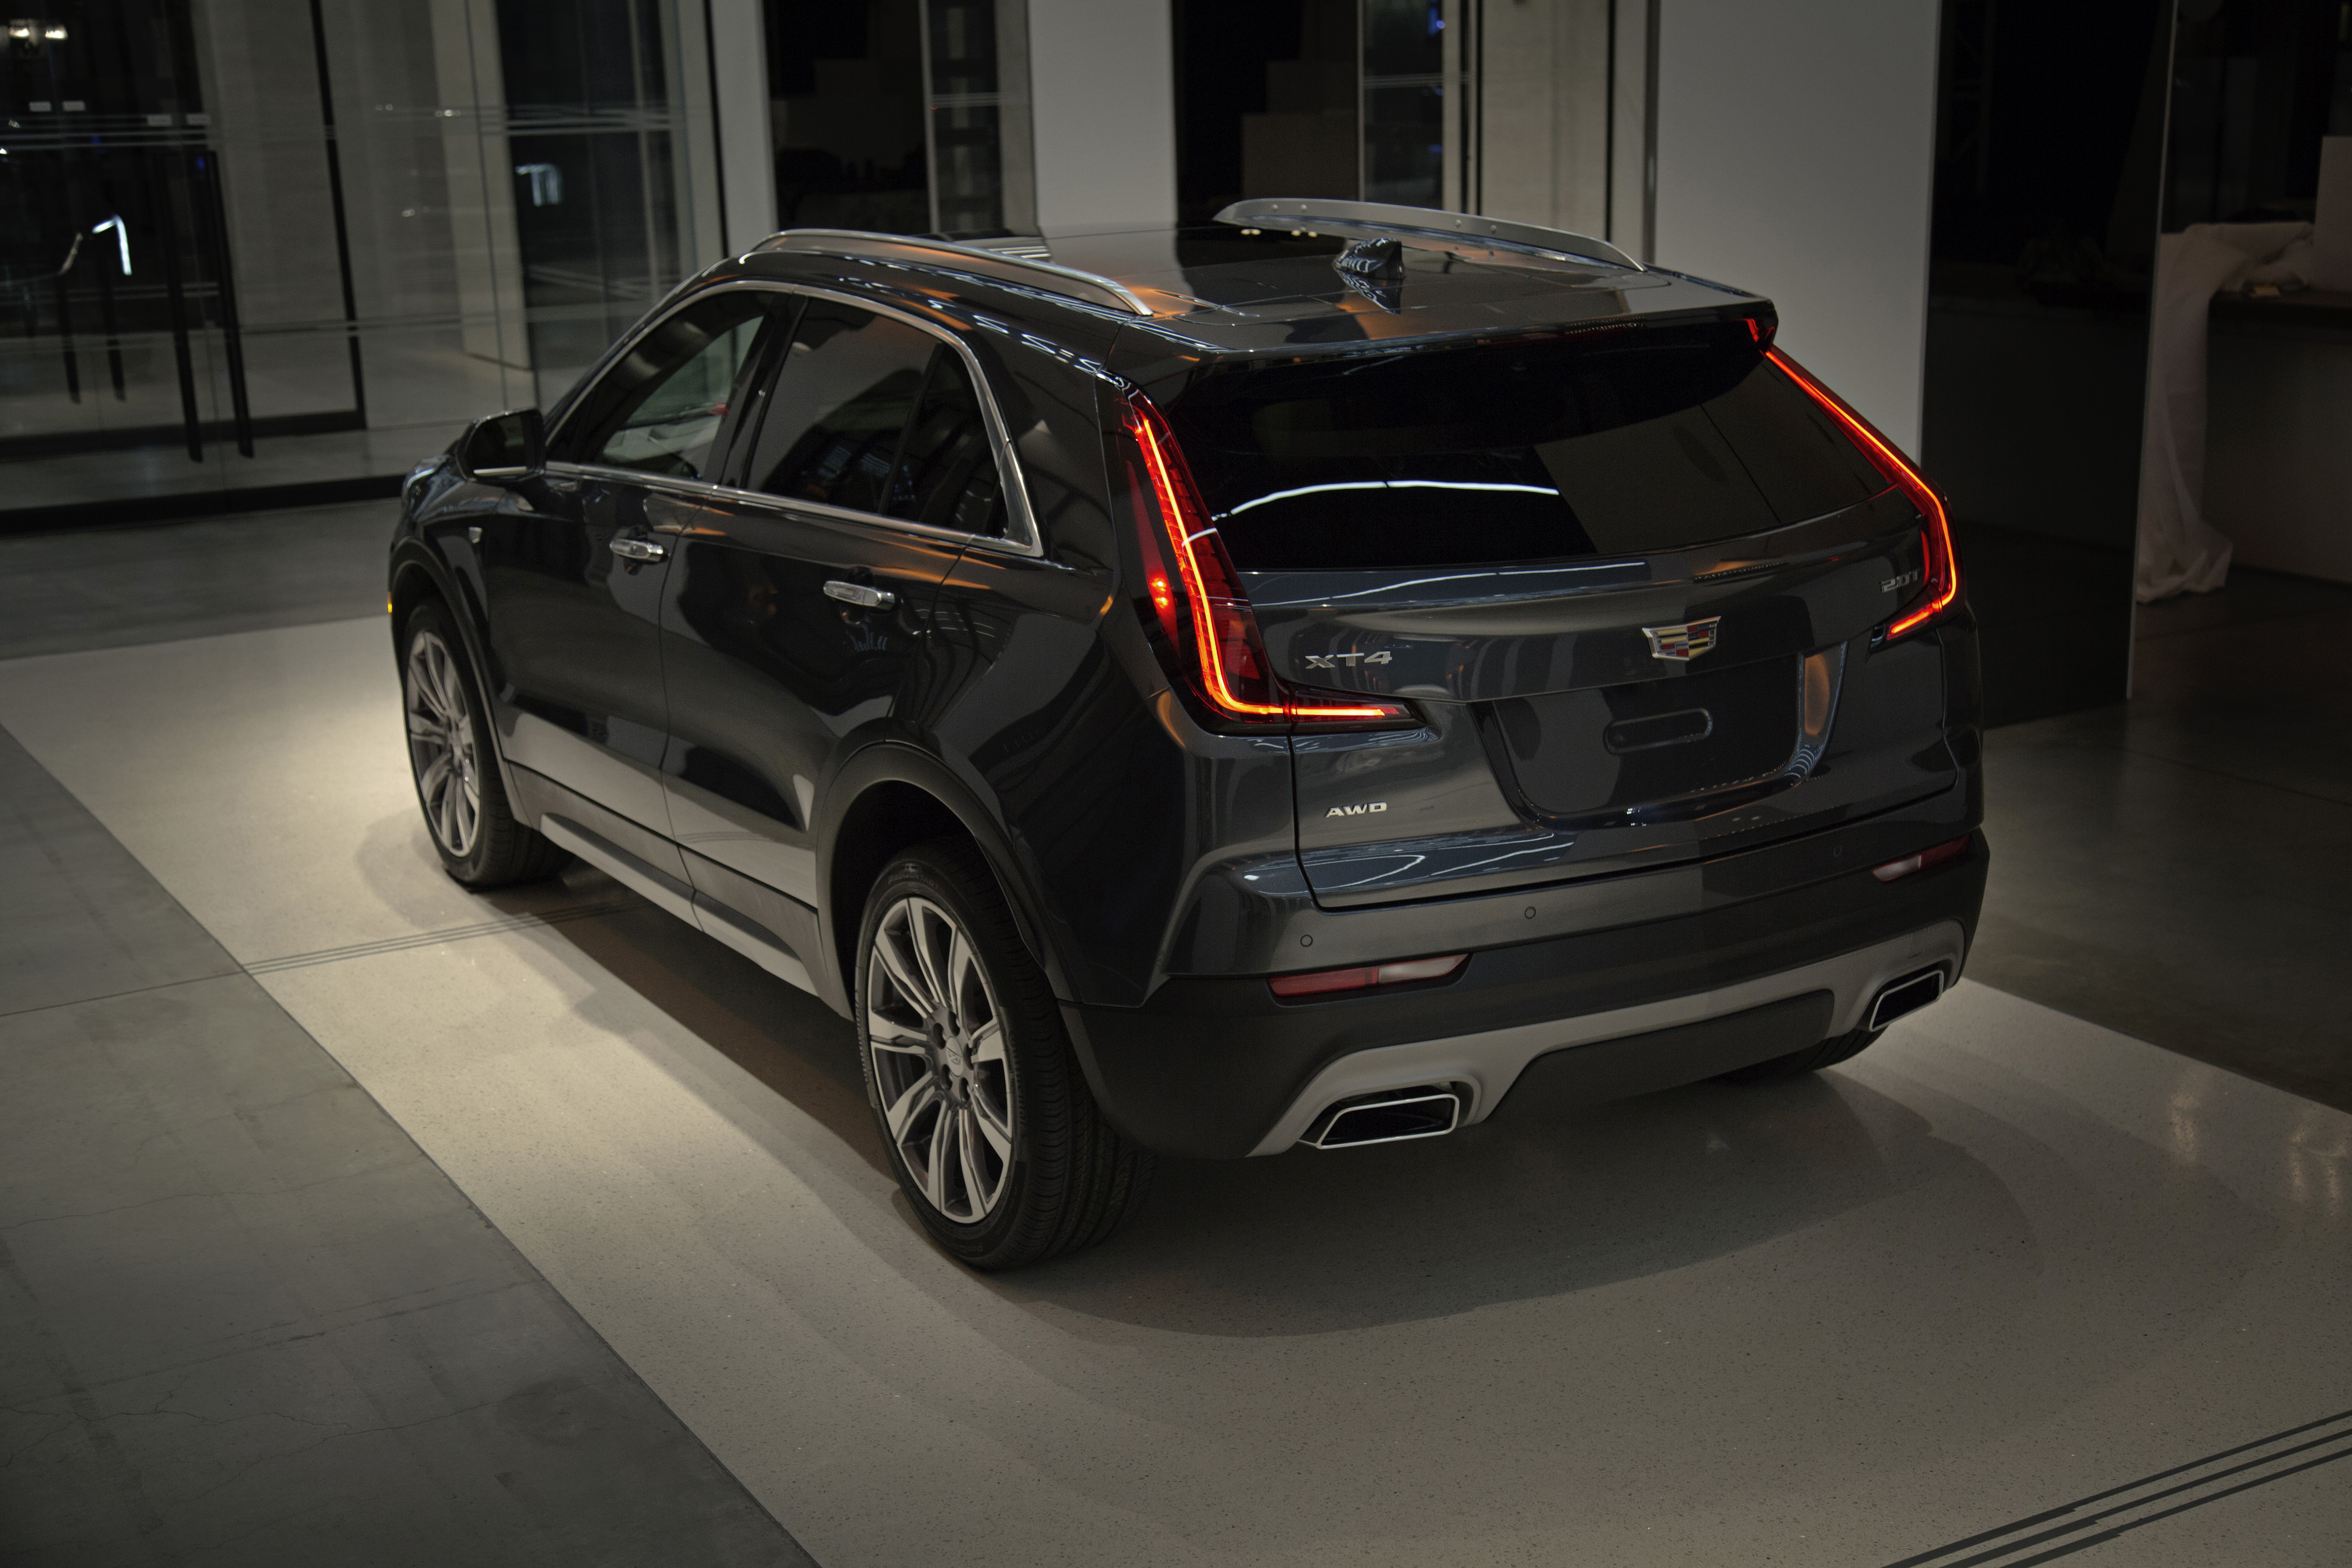 Cadillac Introduces XT4 Compact SUV